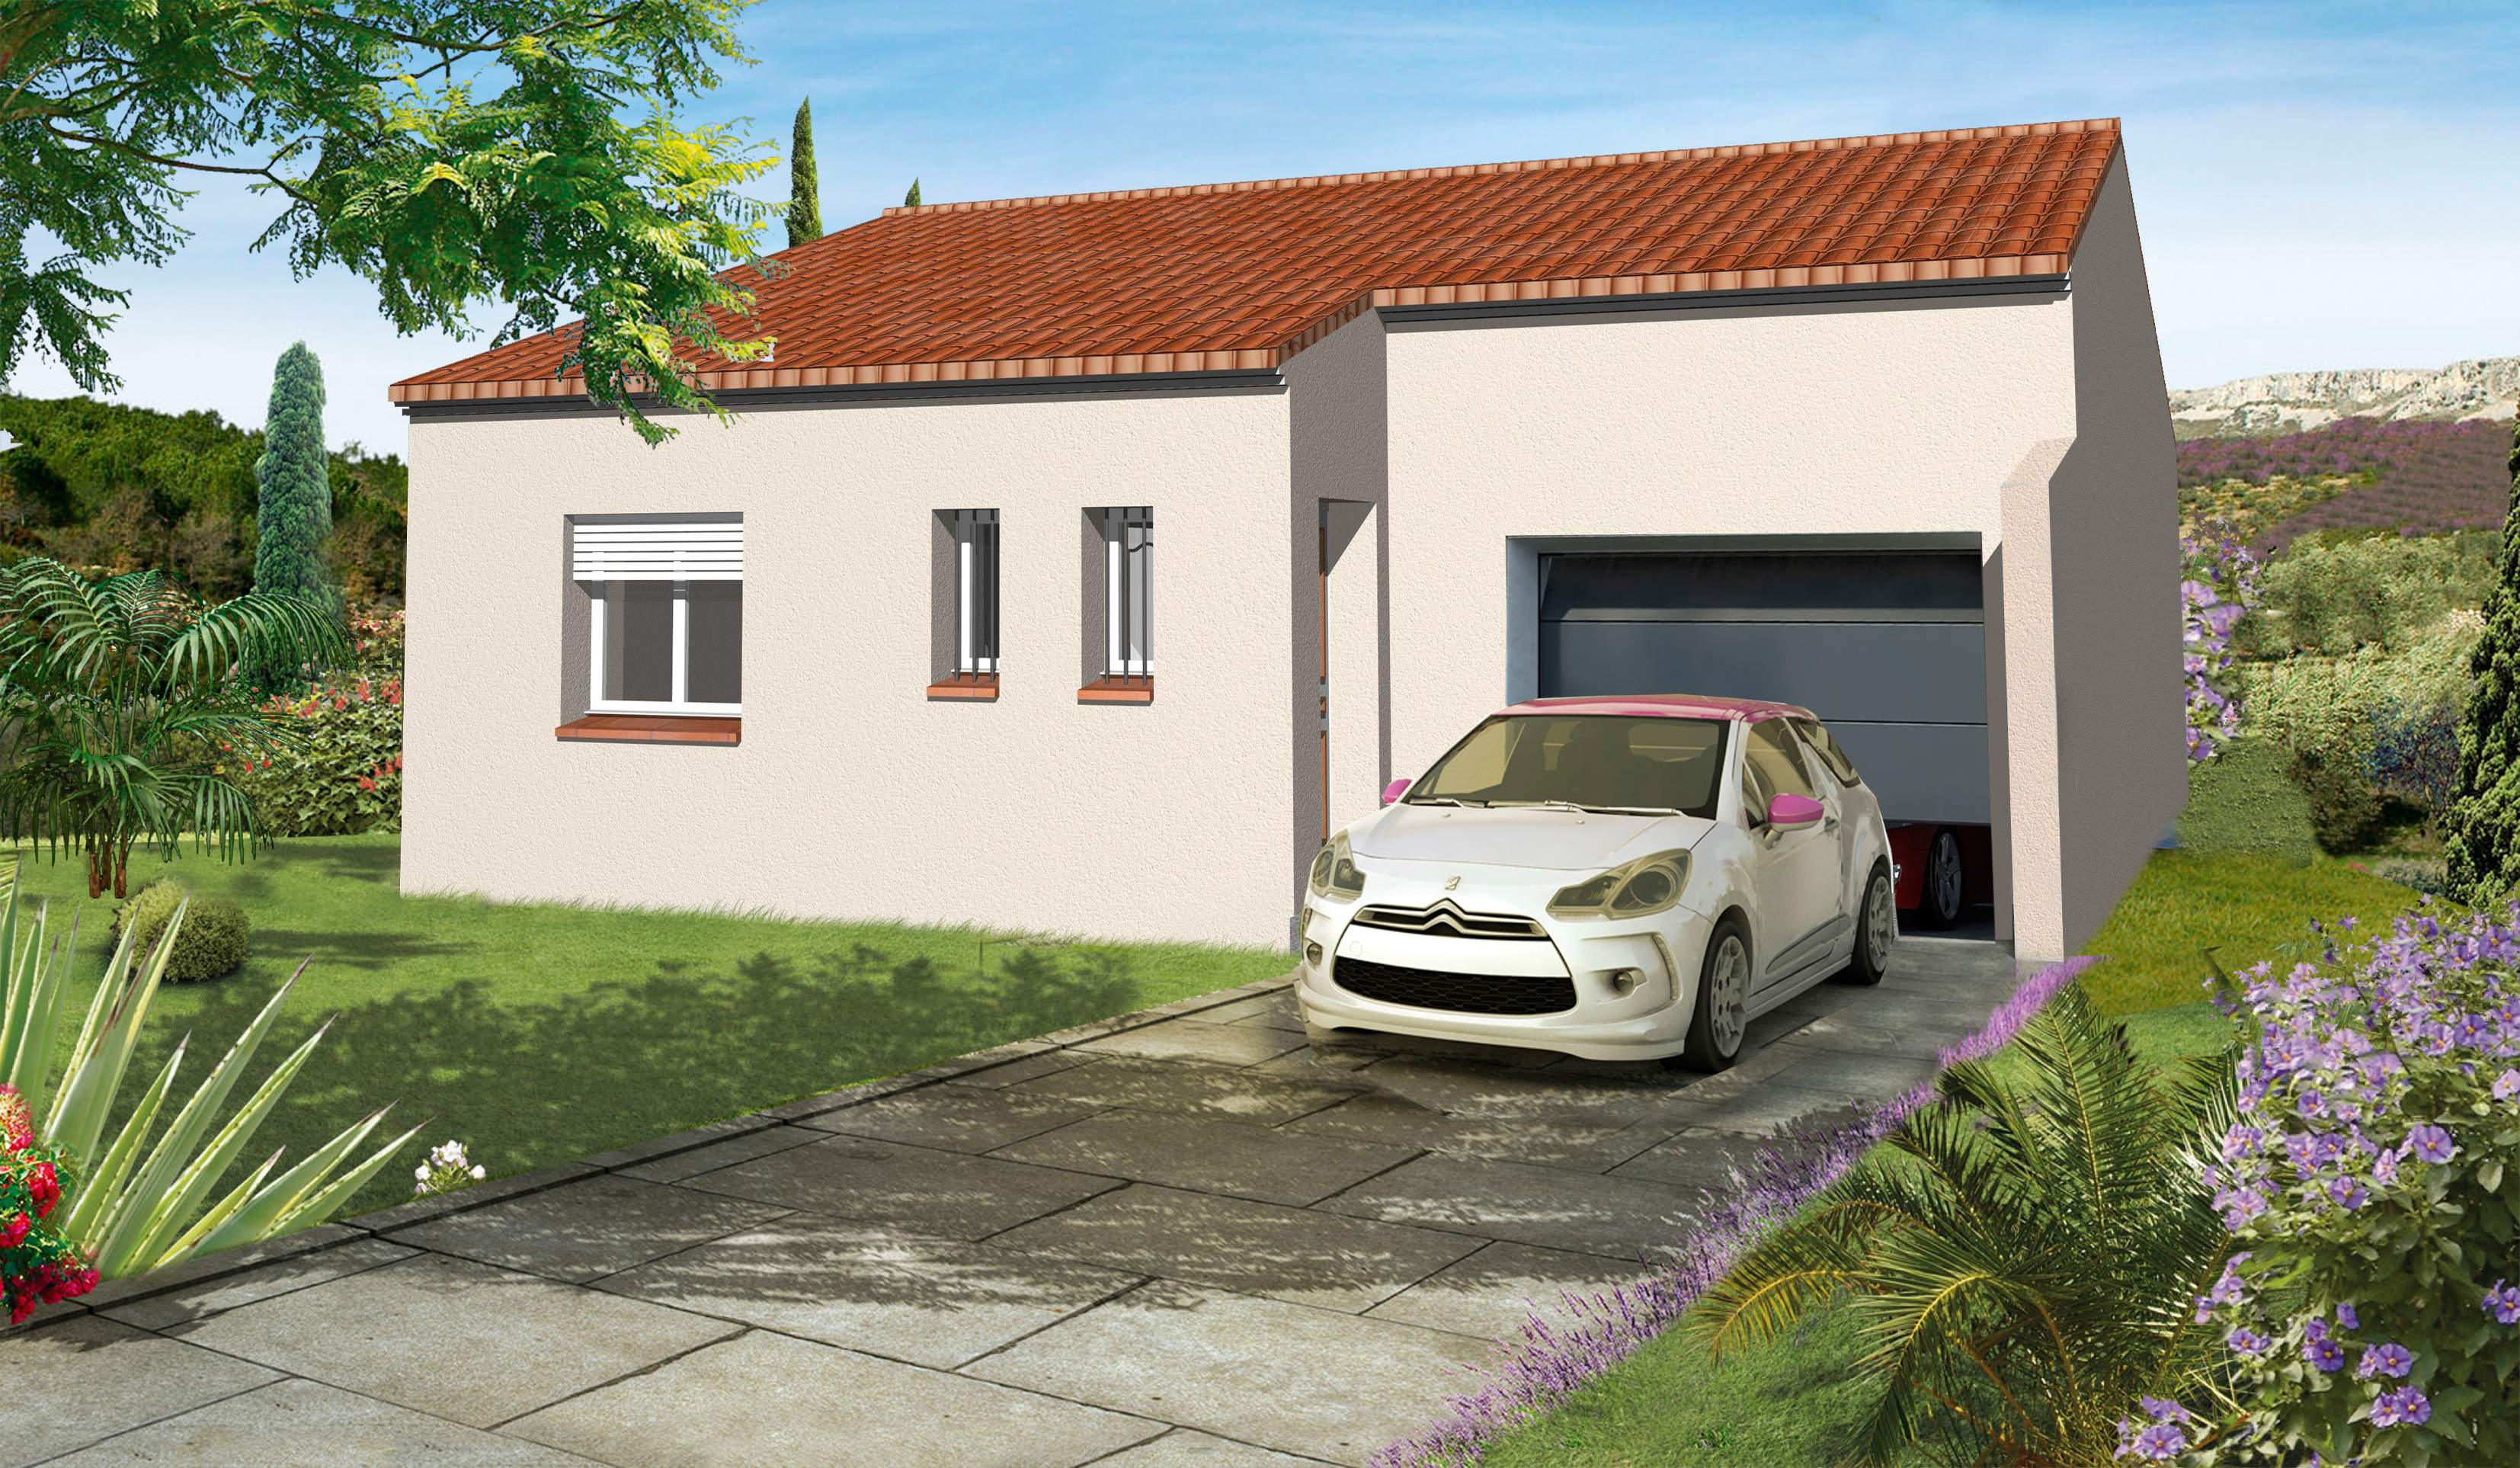 Maisons + Terrains du constructeur XXL CREATION • 62 m² • ORTAFFA